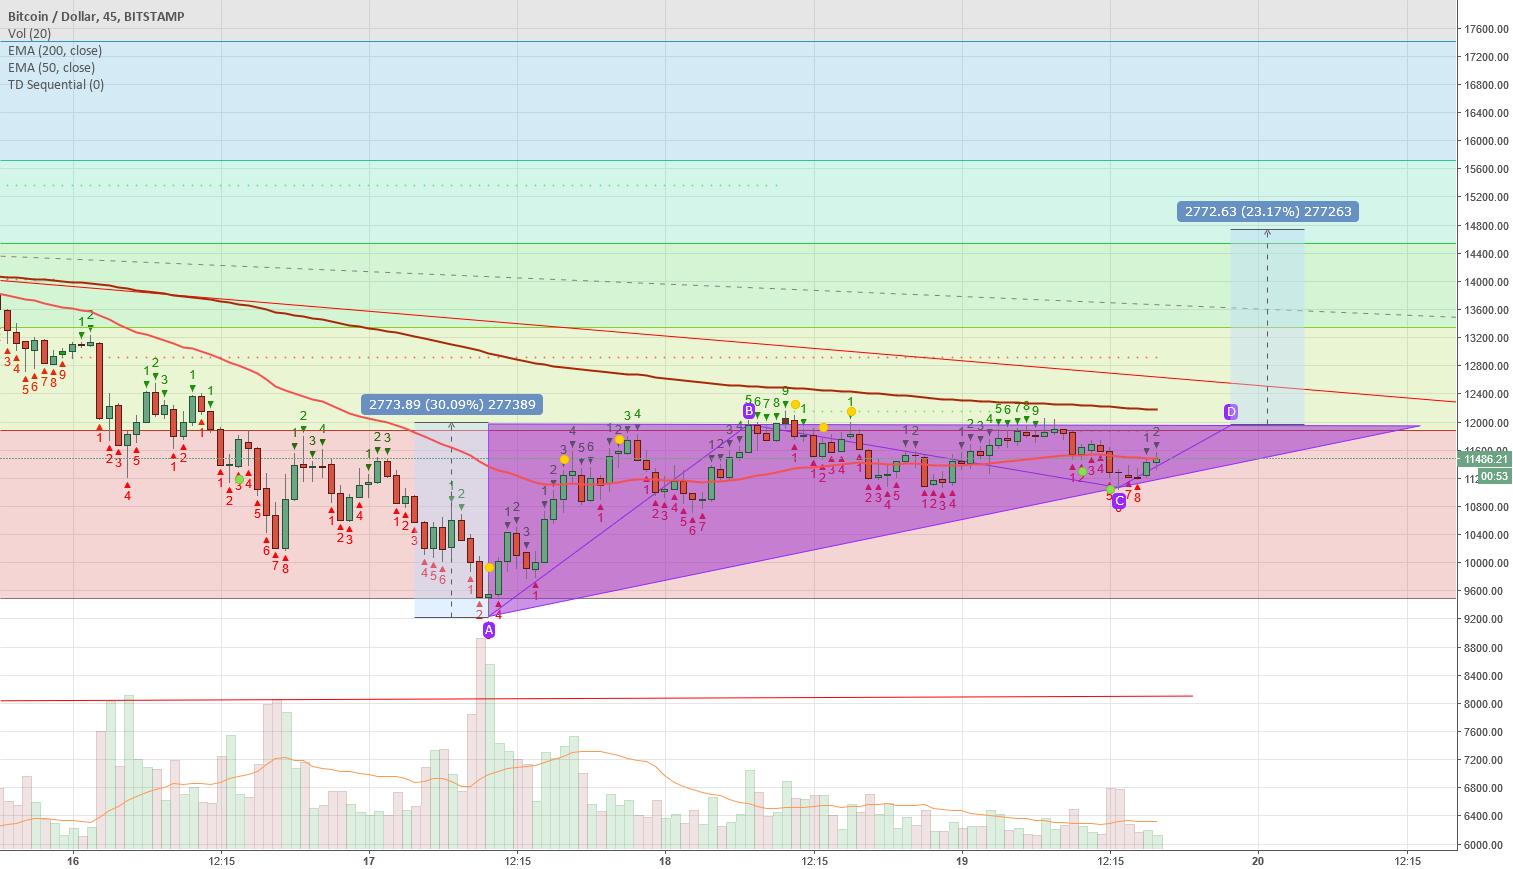 Bitcoin forming bullish triangle at fib. resistance